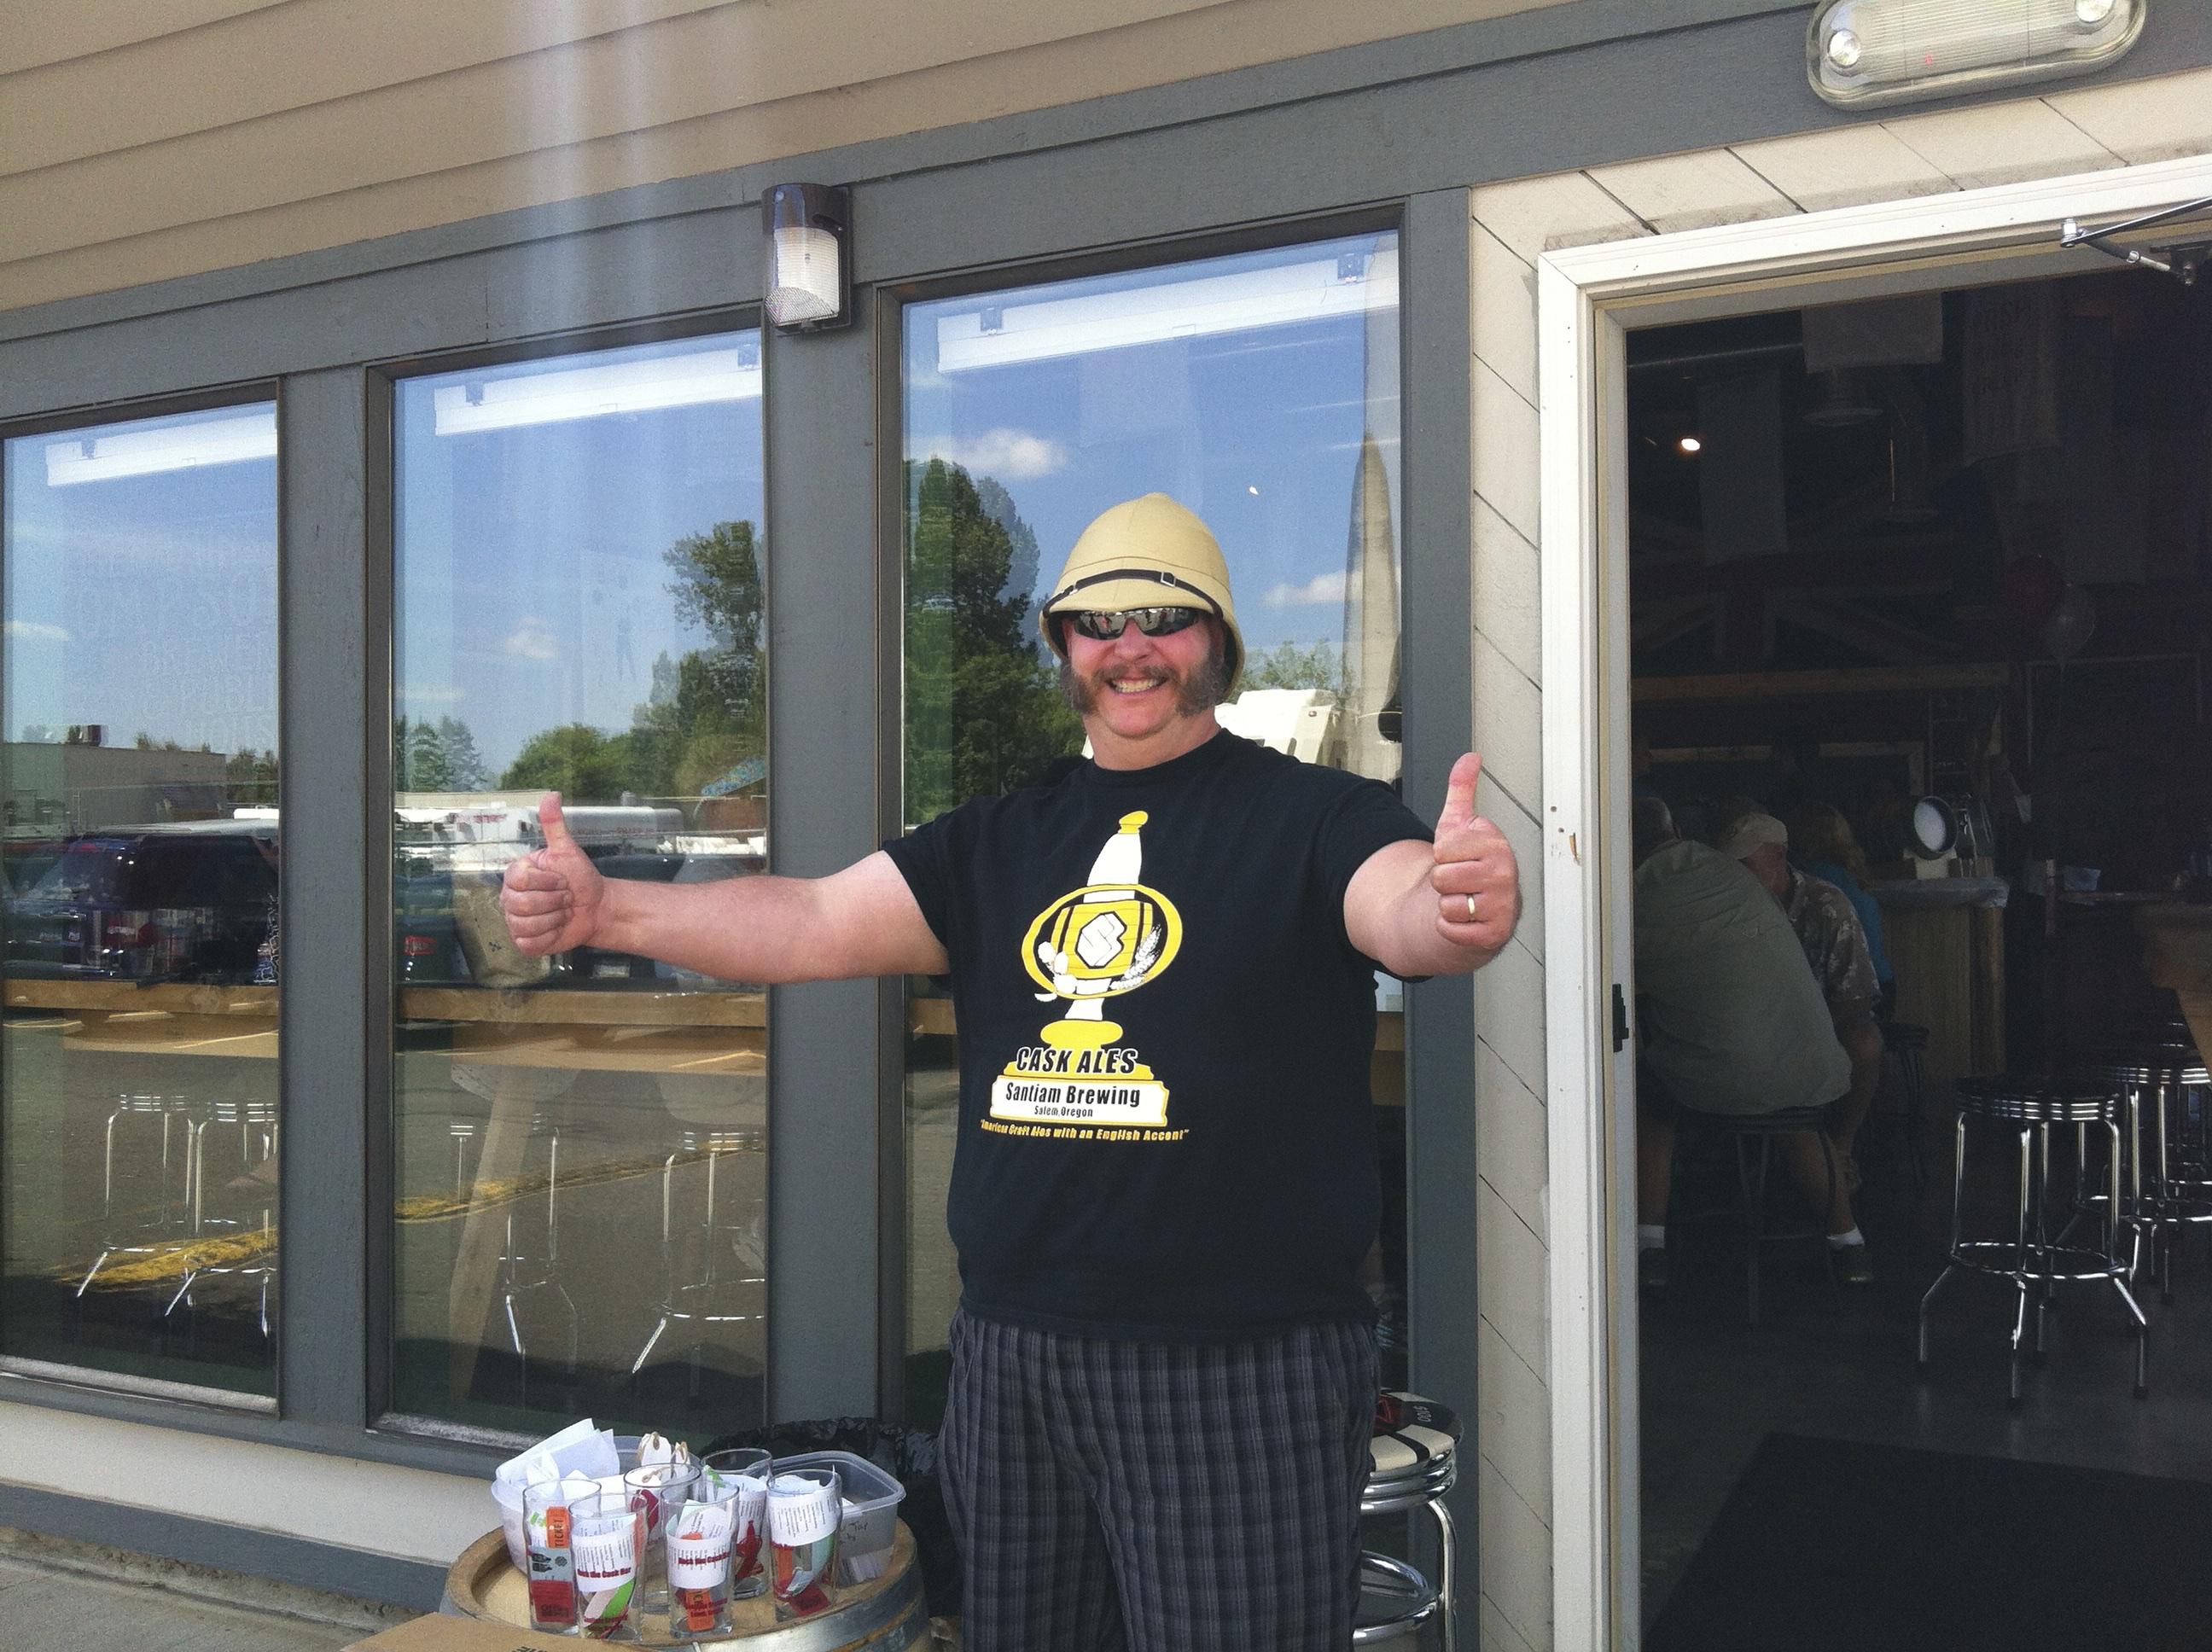 Matthew Killikelly of Santiam Brewing at Rock the Cask Bar